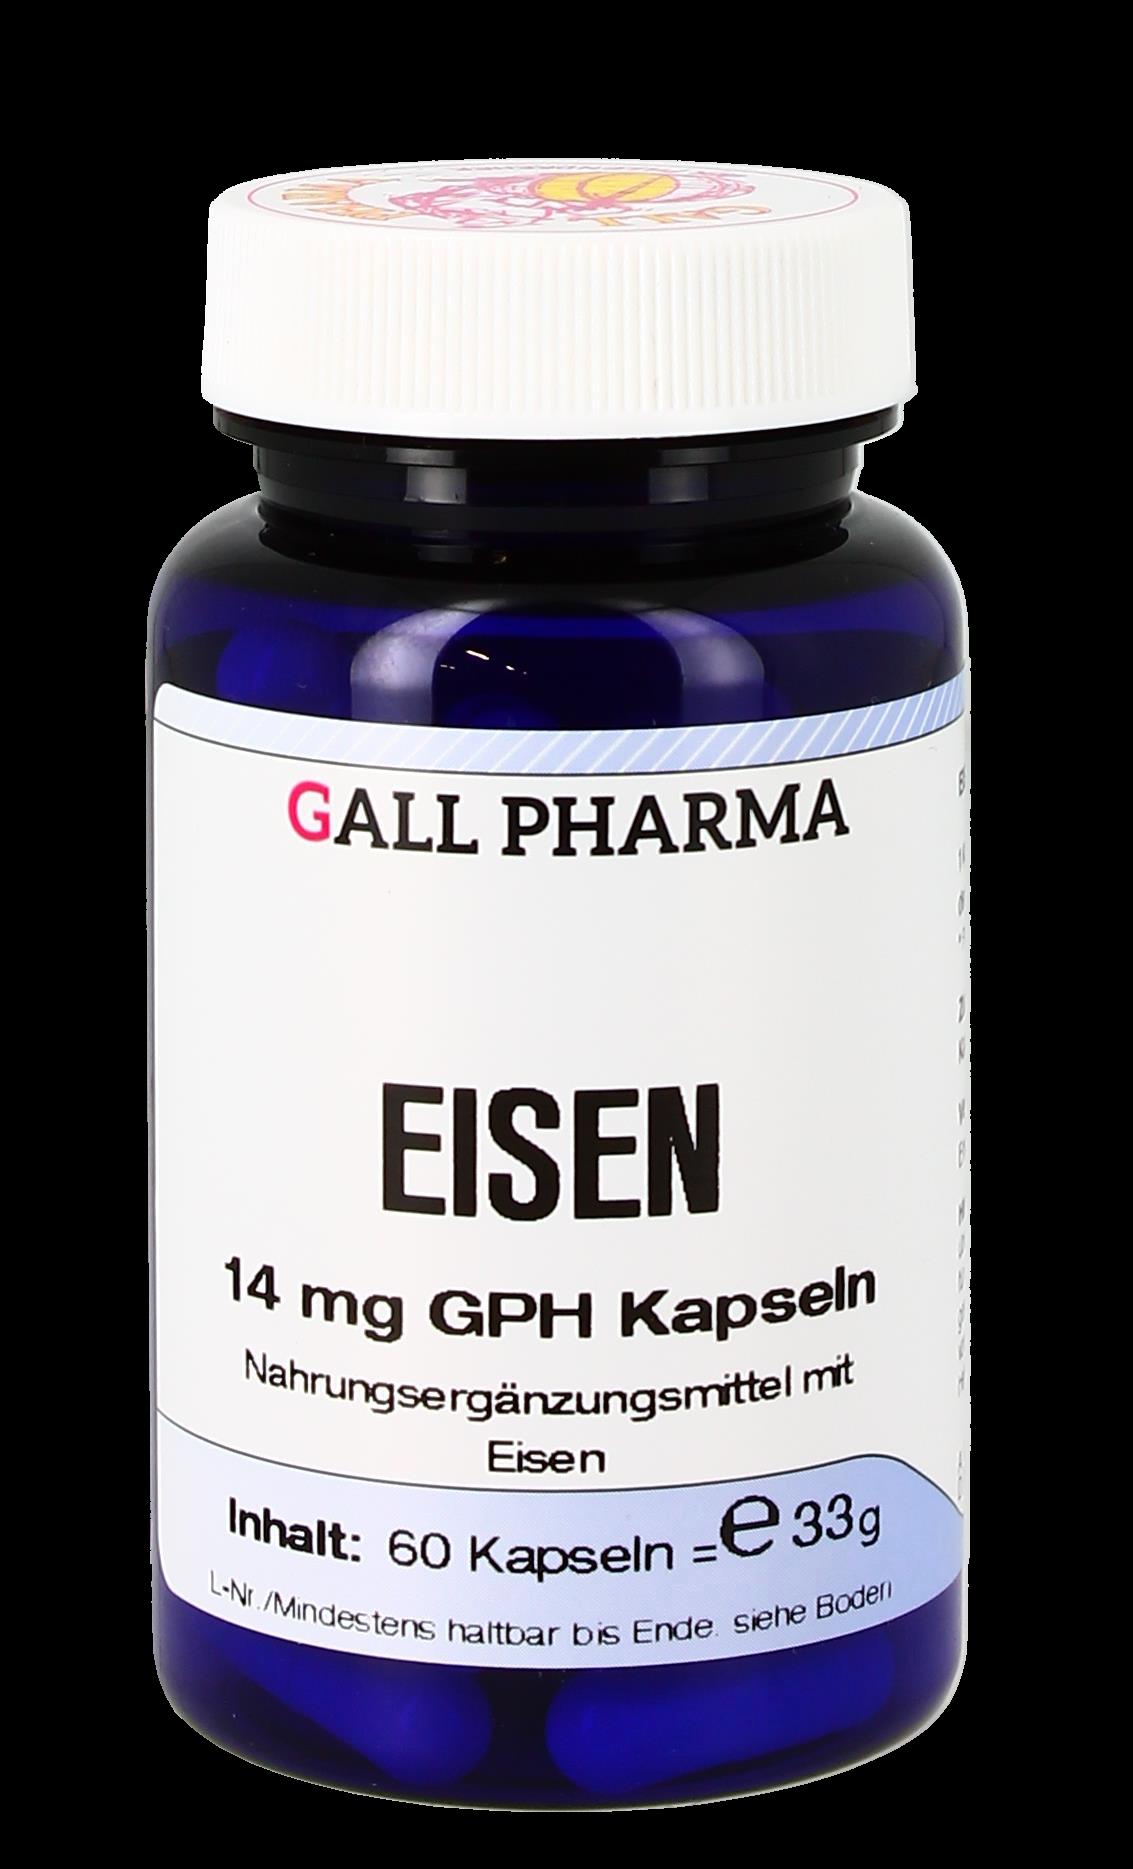 Eisen 14 mg GPH Kapseln